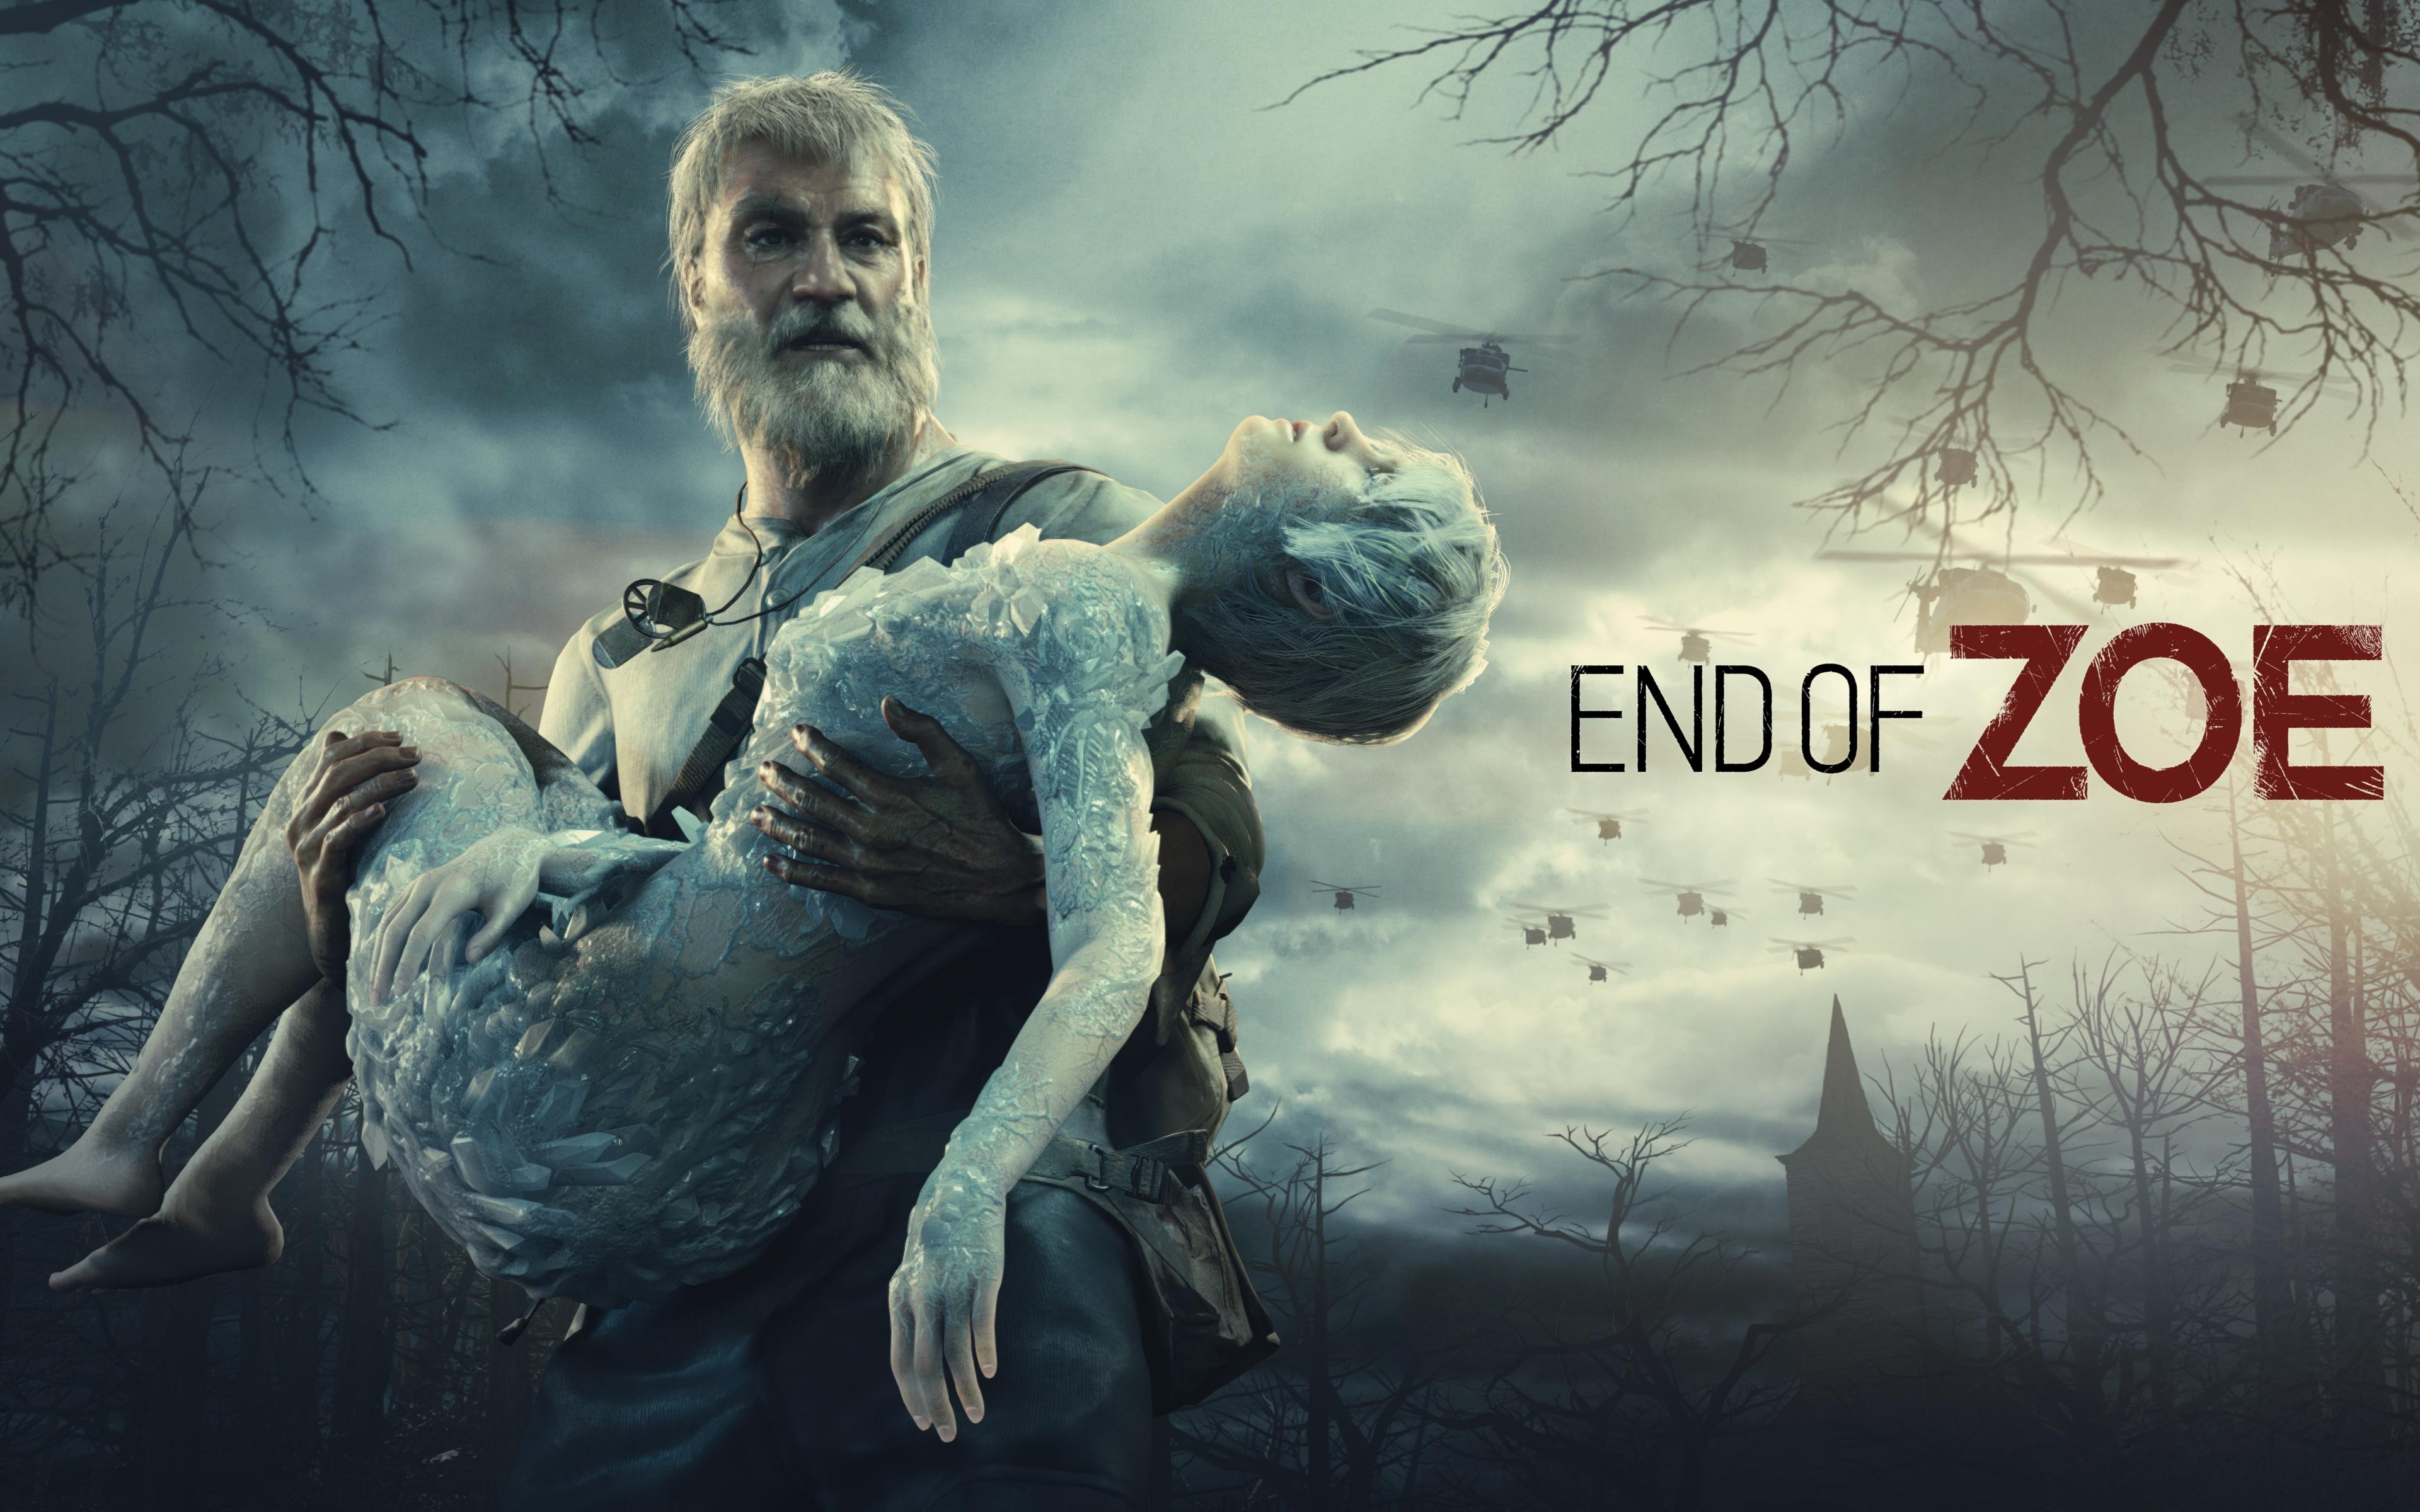 3840x2400 Resident Evil 7 Biohazard End Of Zoe 4k 3840x2400